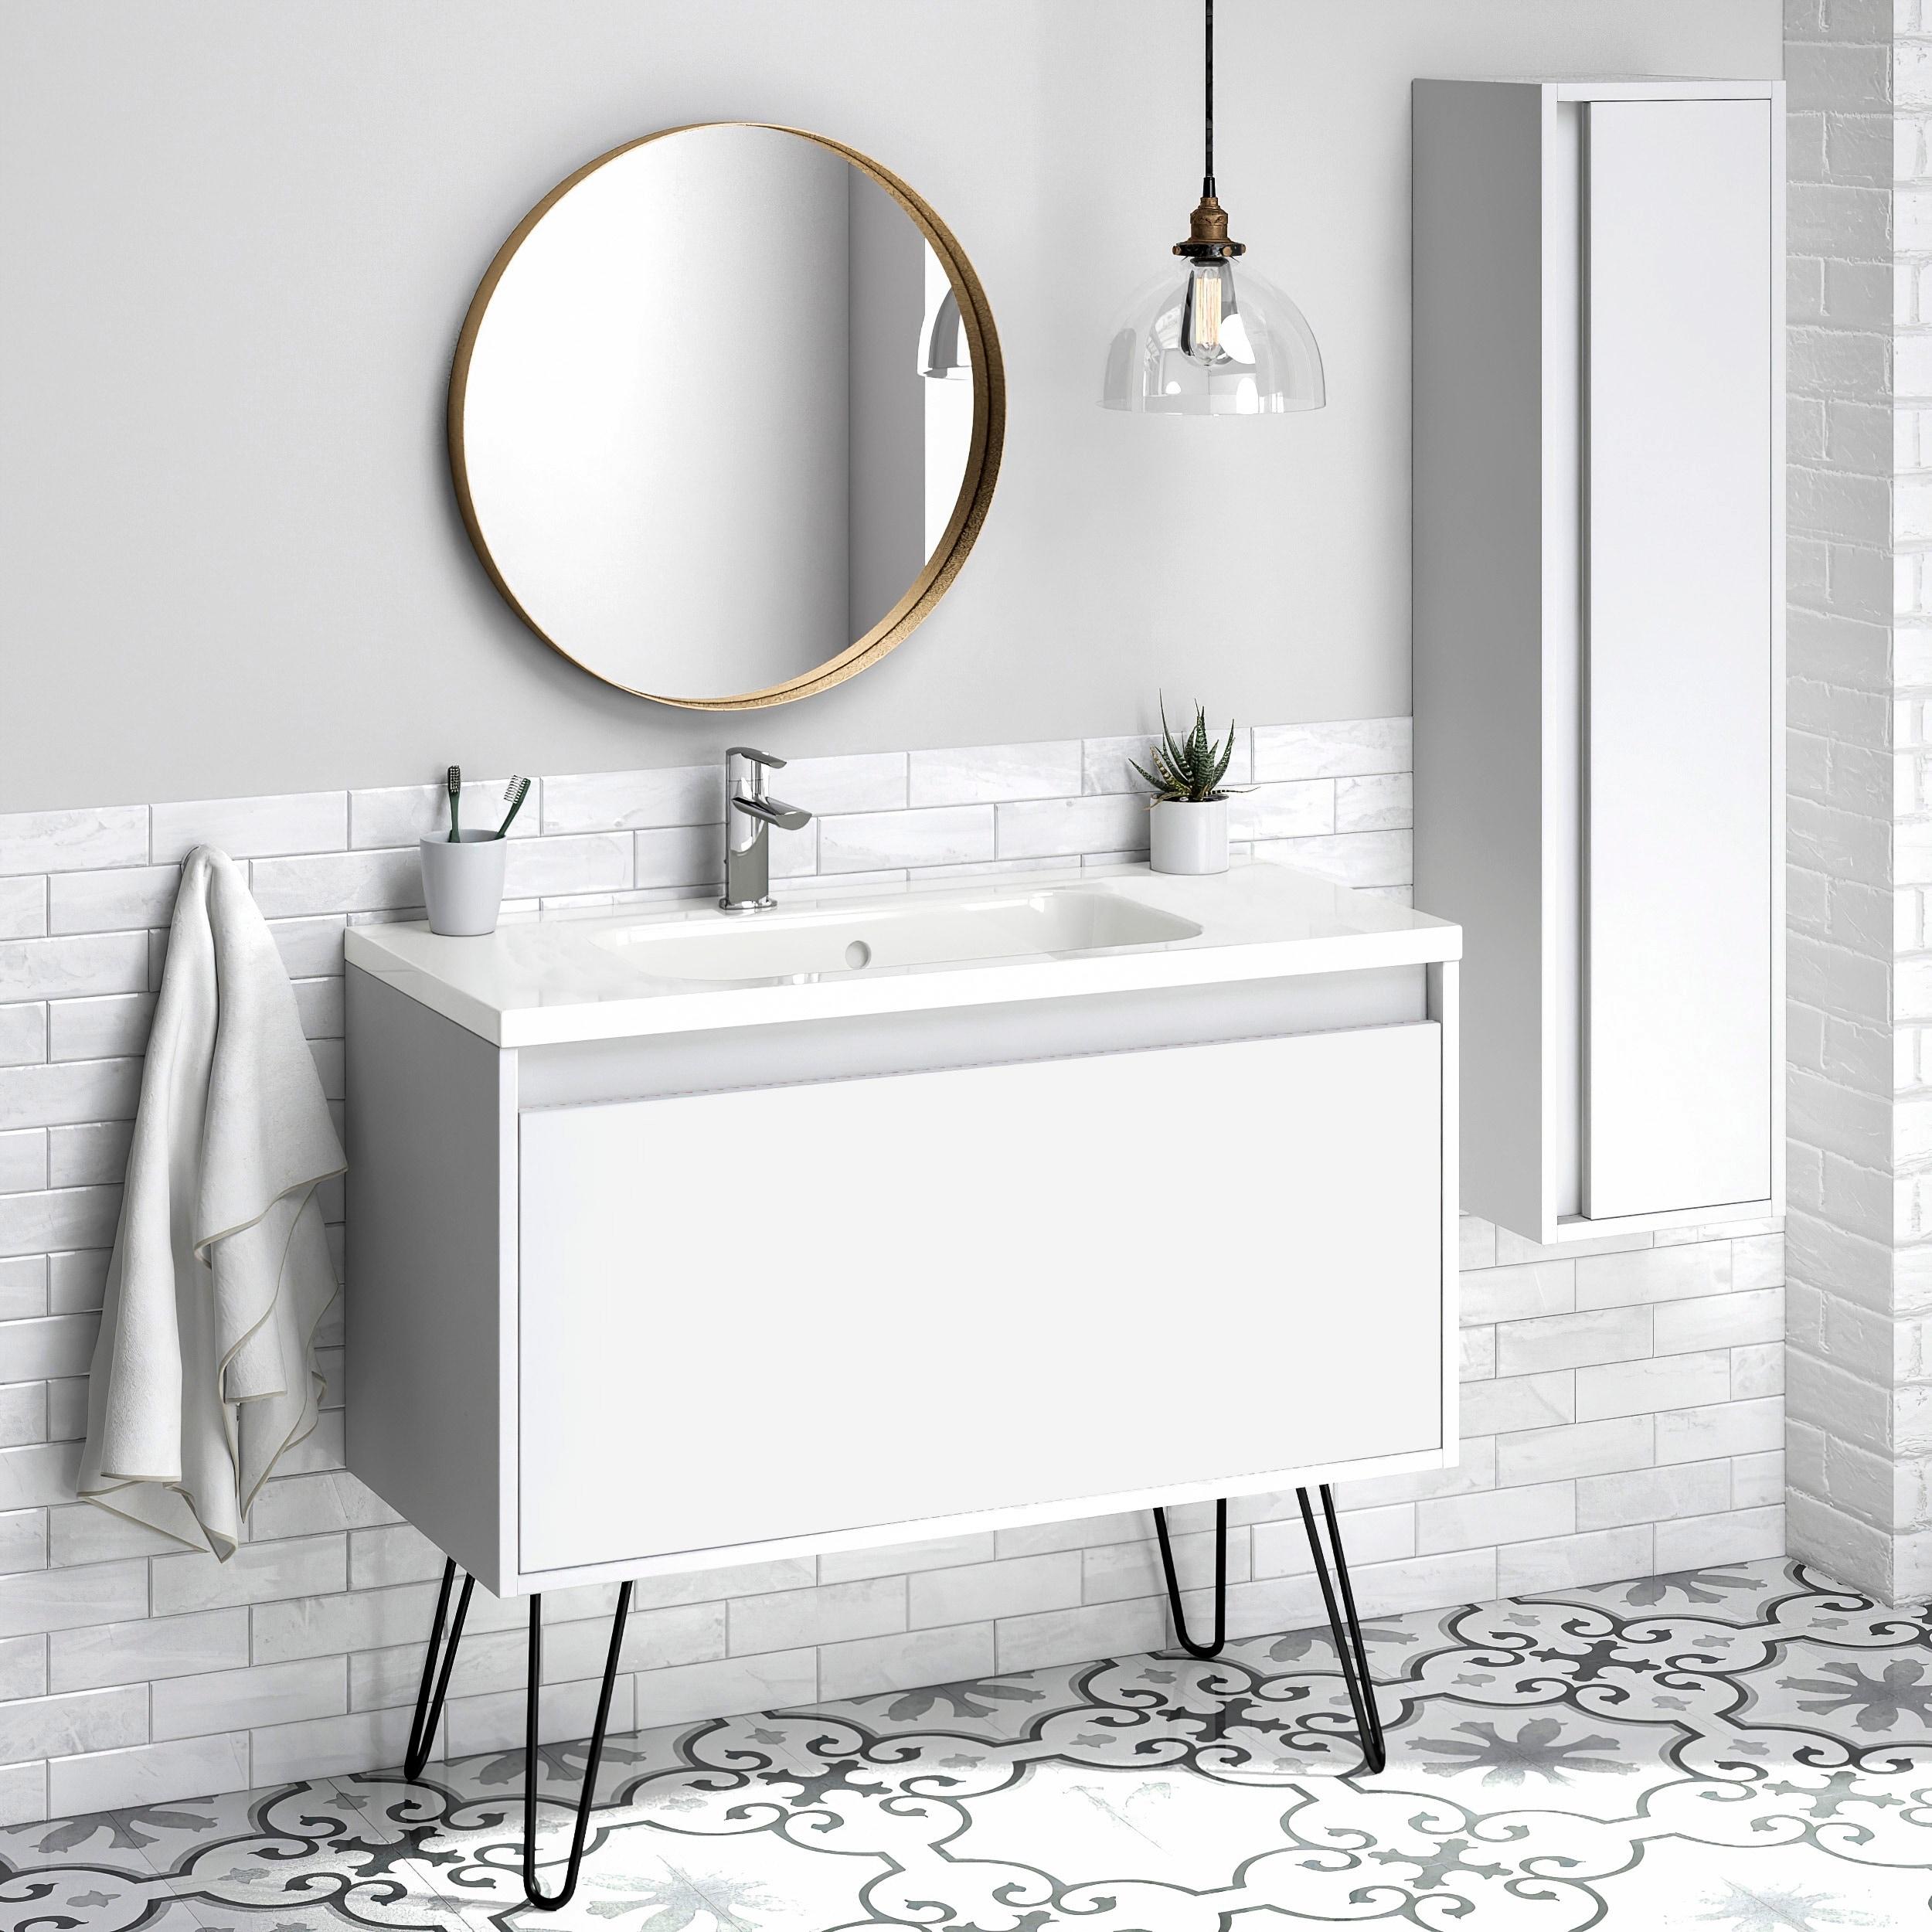 40 Bathroom Vanity Cabinet Ceramic Sink Legs Tribeca Fs W 40 X H 35 X D 18 In Rhd White Overstock 31644219